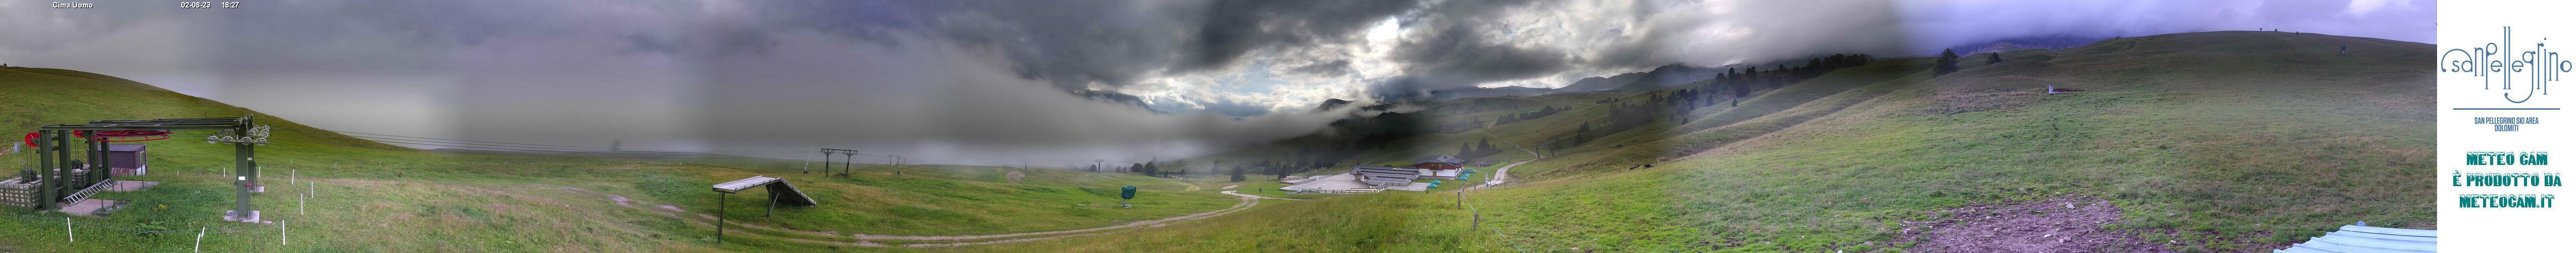 Webcam panoramica Chiesetta - Passo San Pellegrino-Falcade